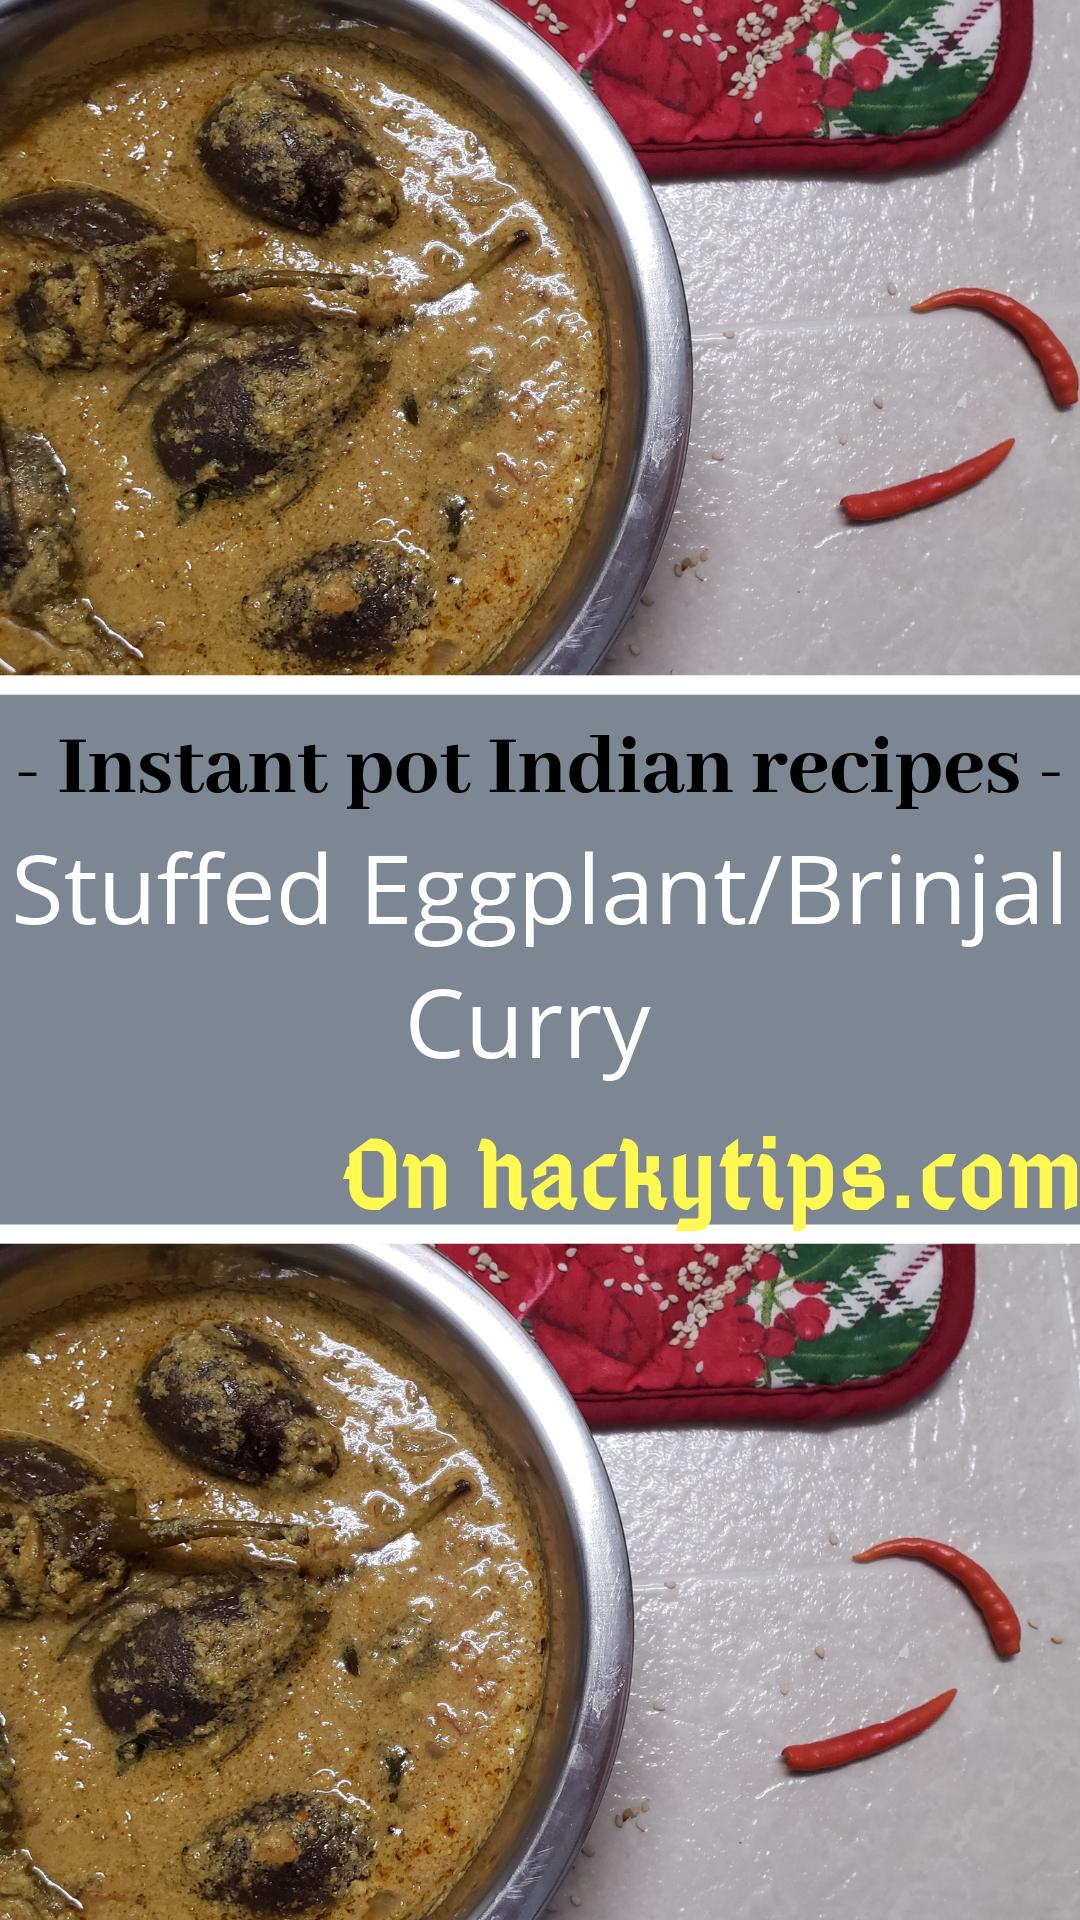 Stuffed Eggplant/Brinjal Instant Pot